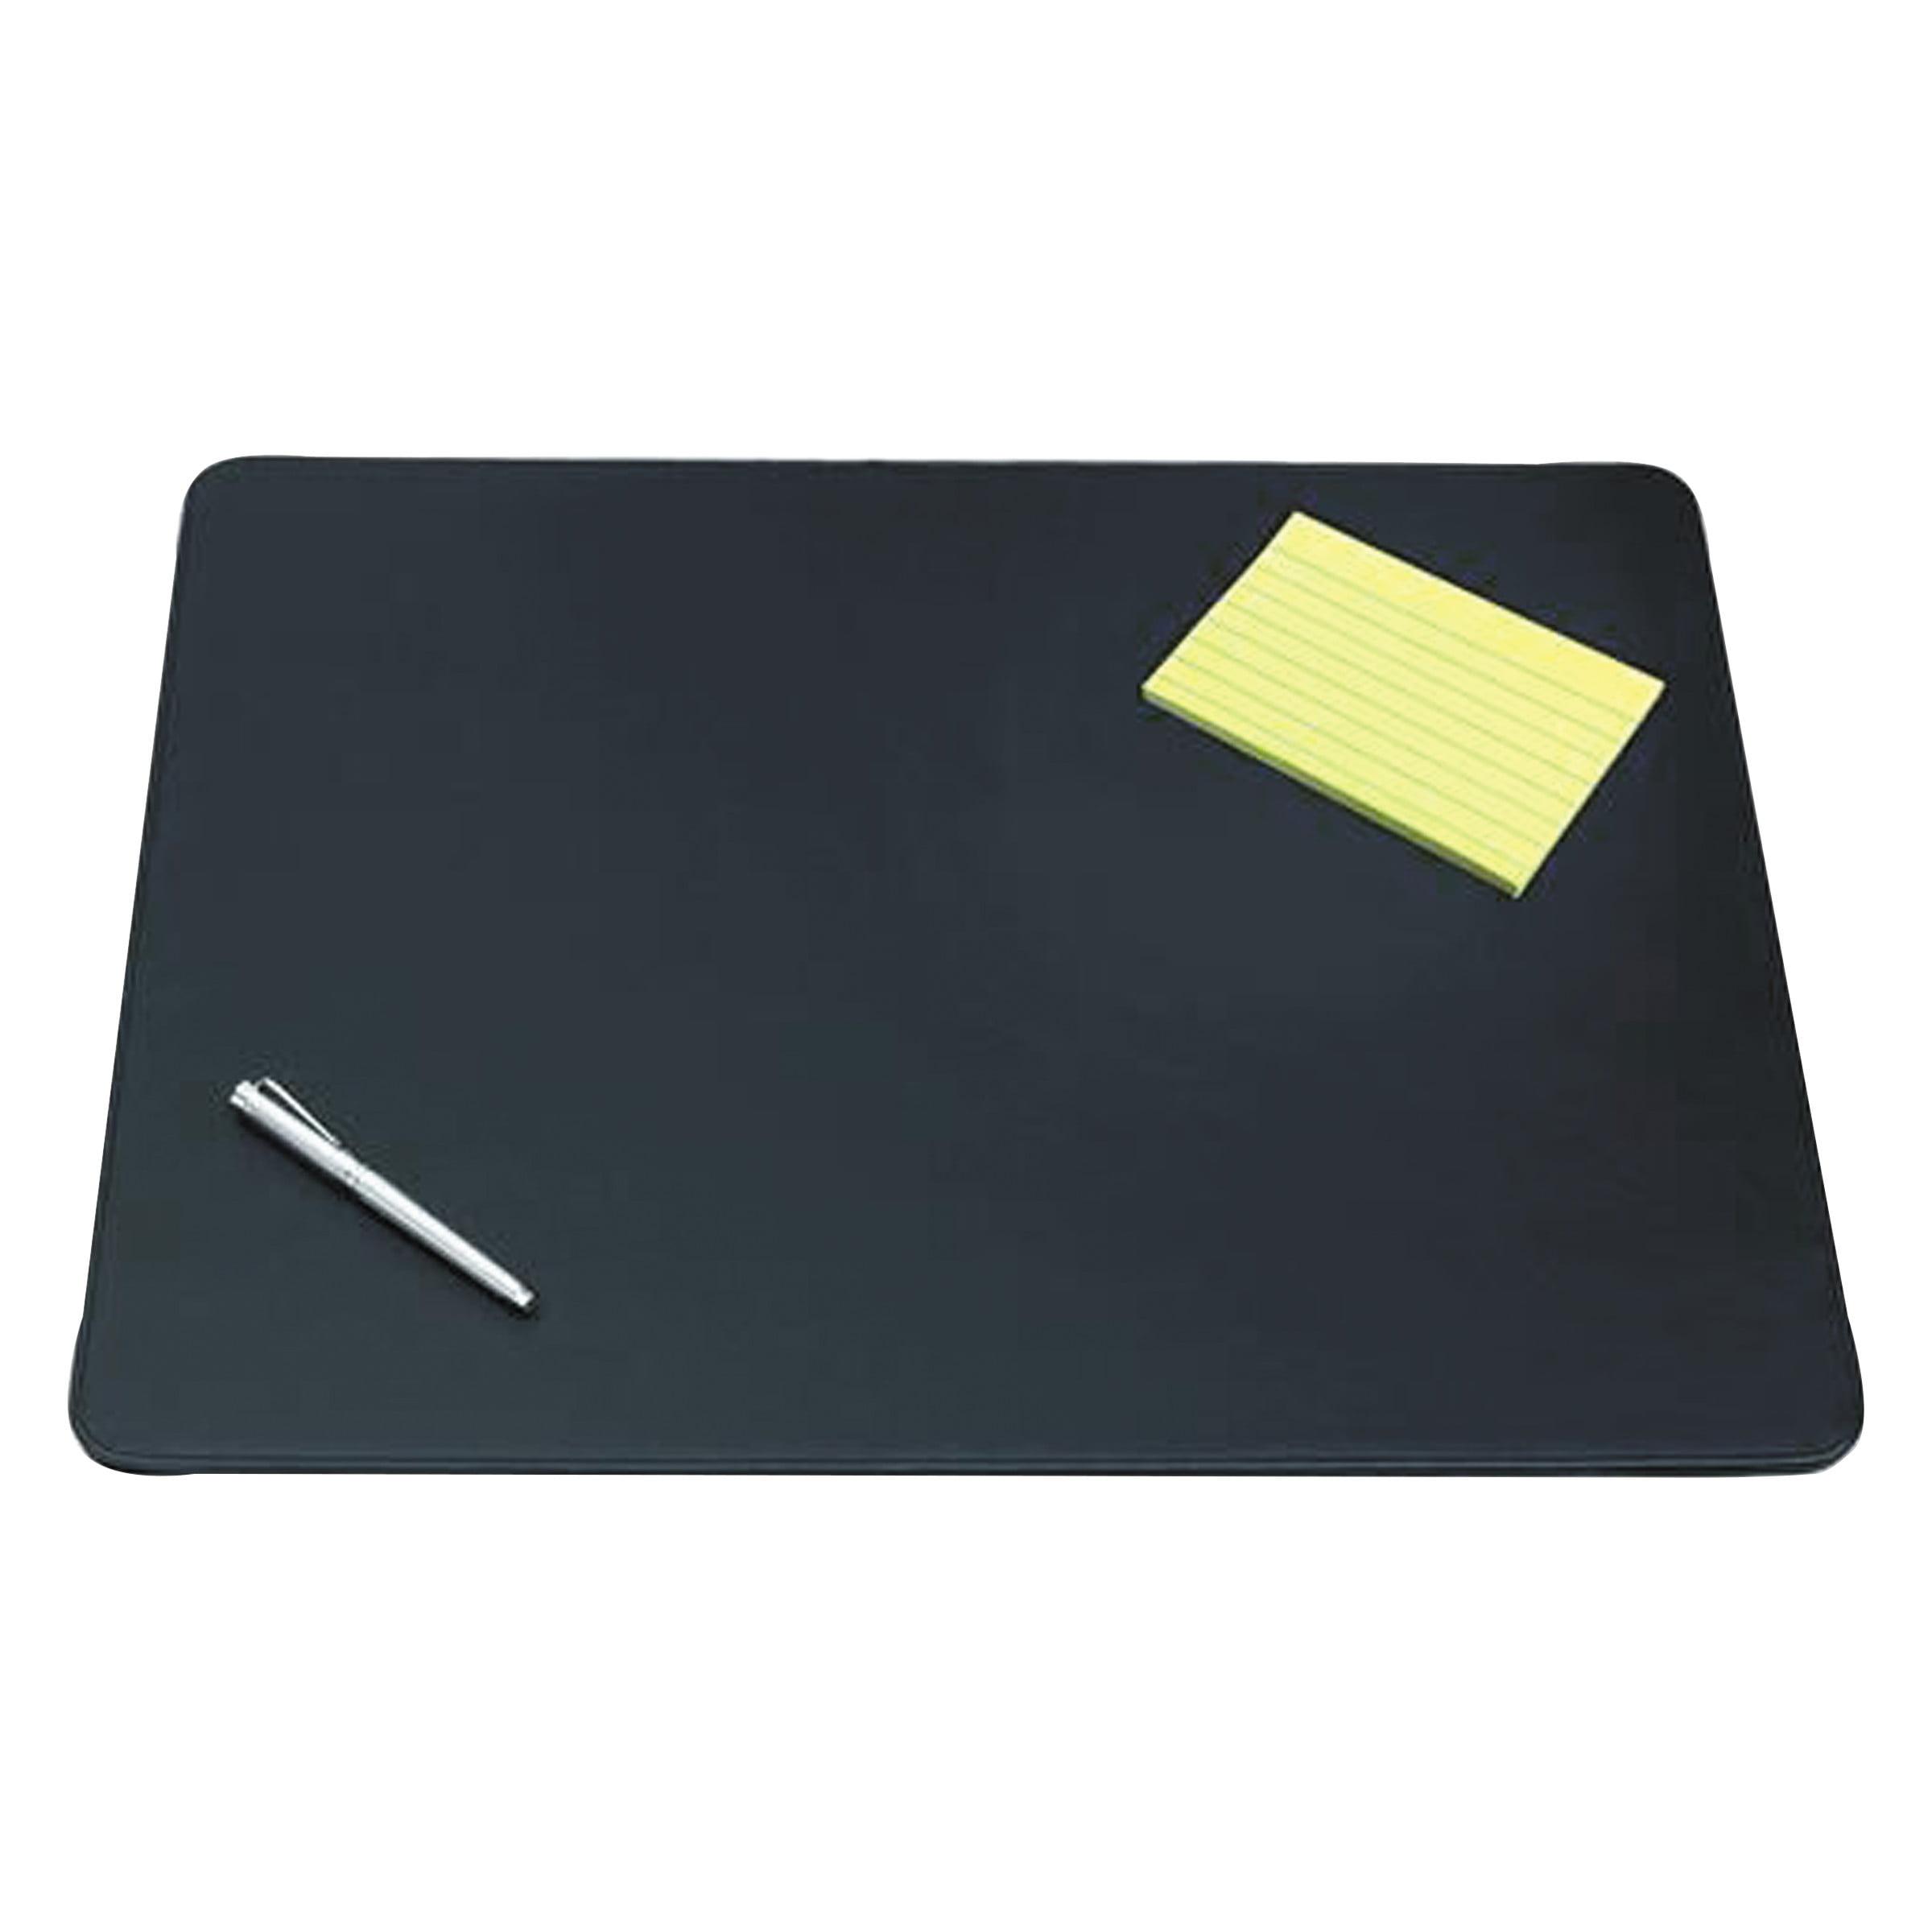 "19"" x 24"" Sagamore Executive Designer Desk Pad, Black by ARTISTIC LLC"